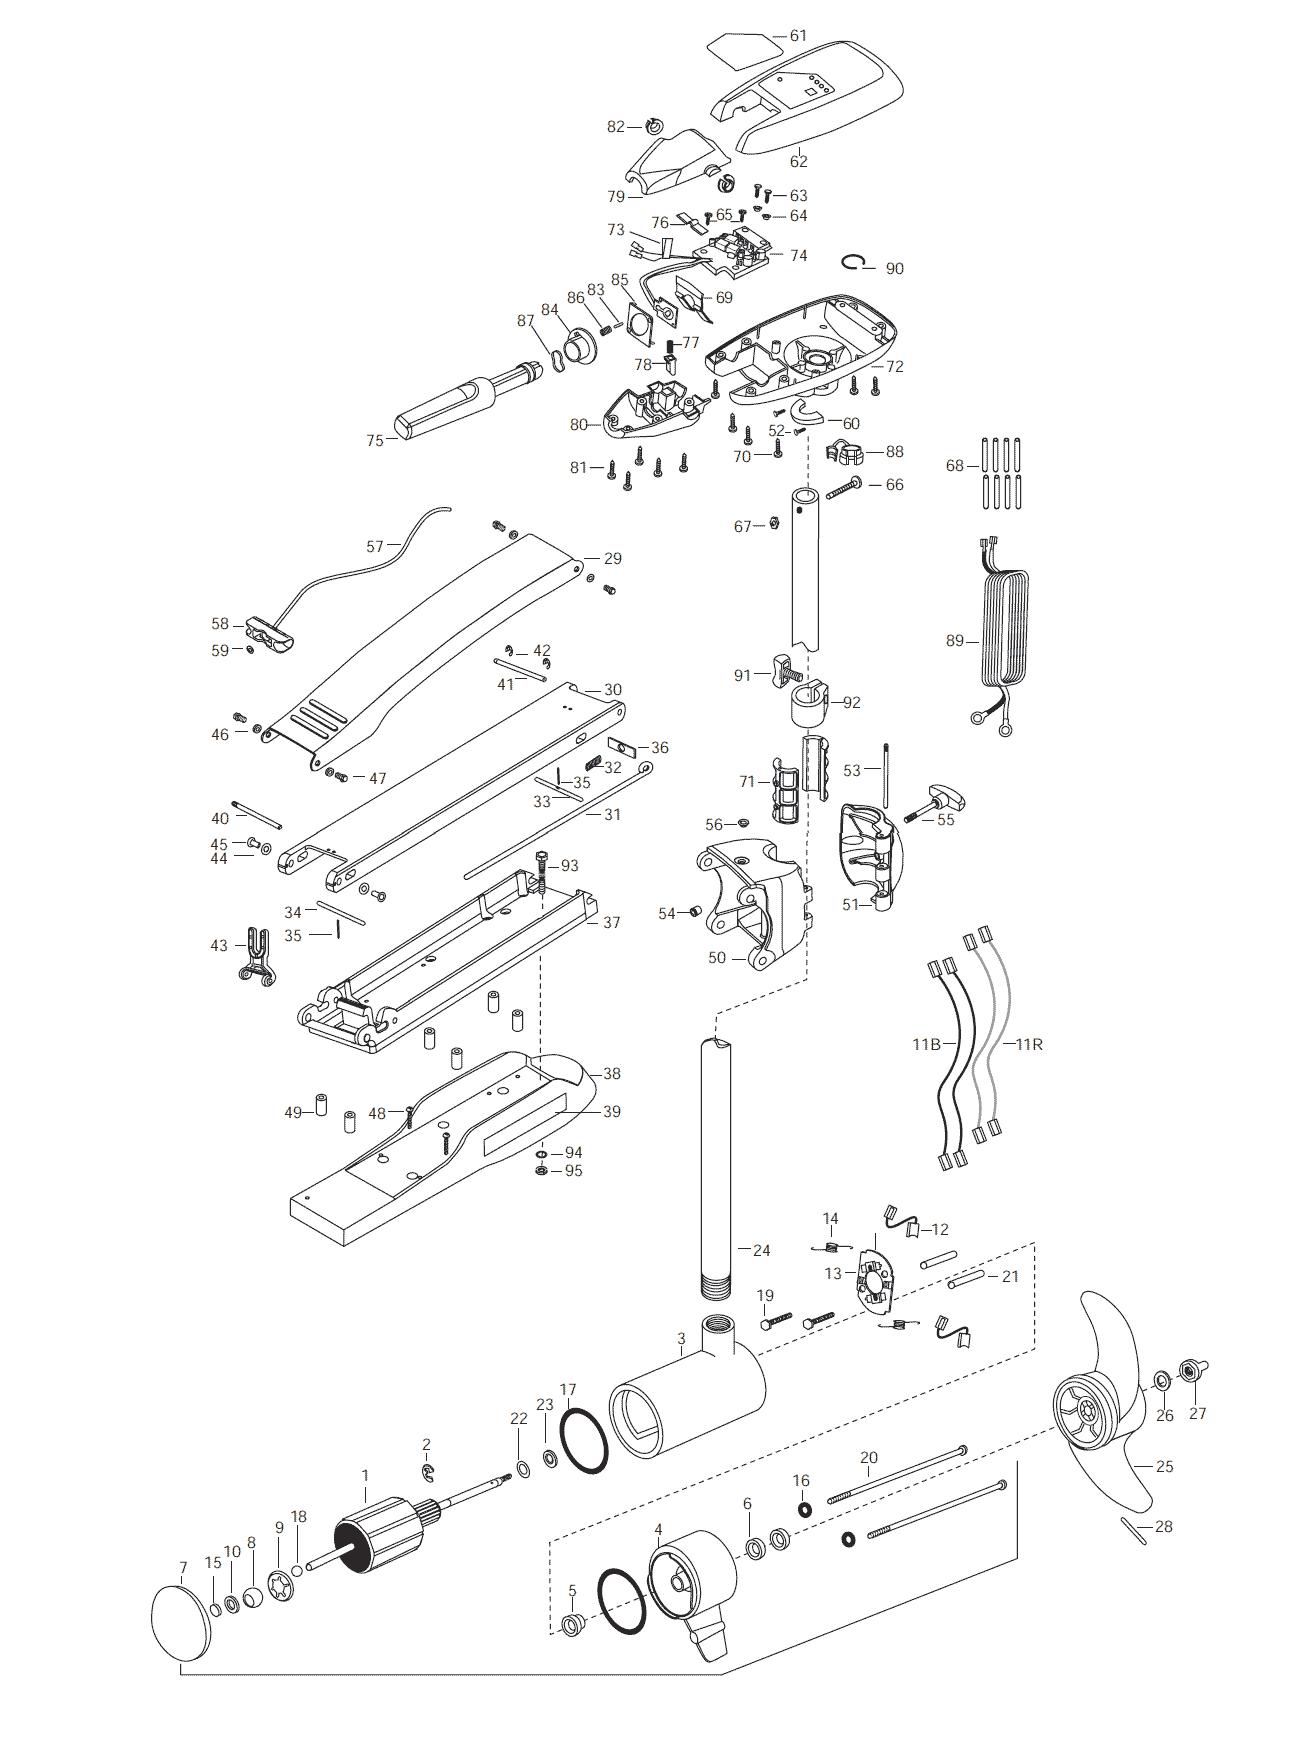 1967 porsche 912 wiring diagrams wiring diagram